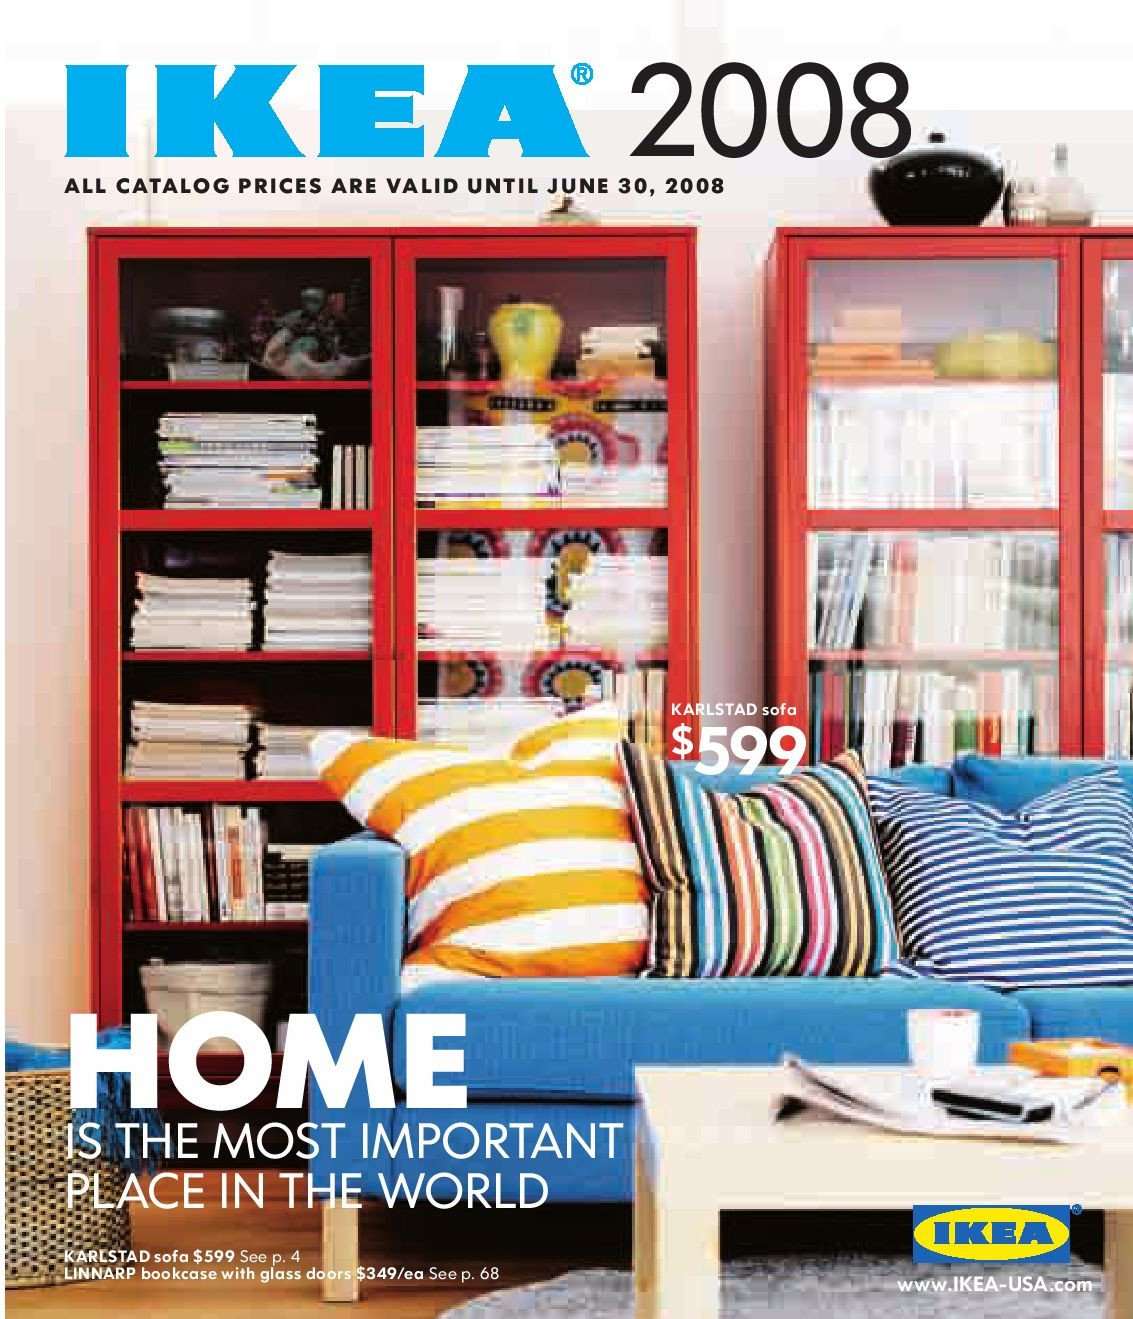 Ikea Bedroom Furniture Set Unique Ikea 2008 Catalog by Odabashianr issuu